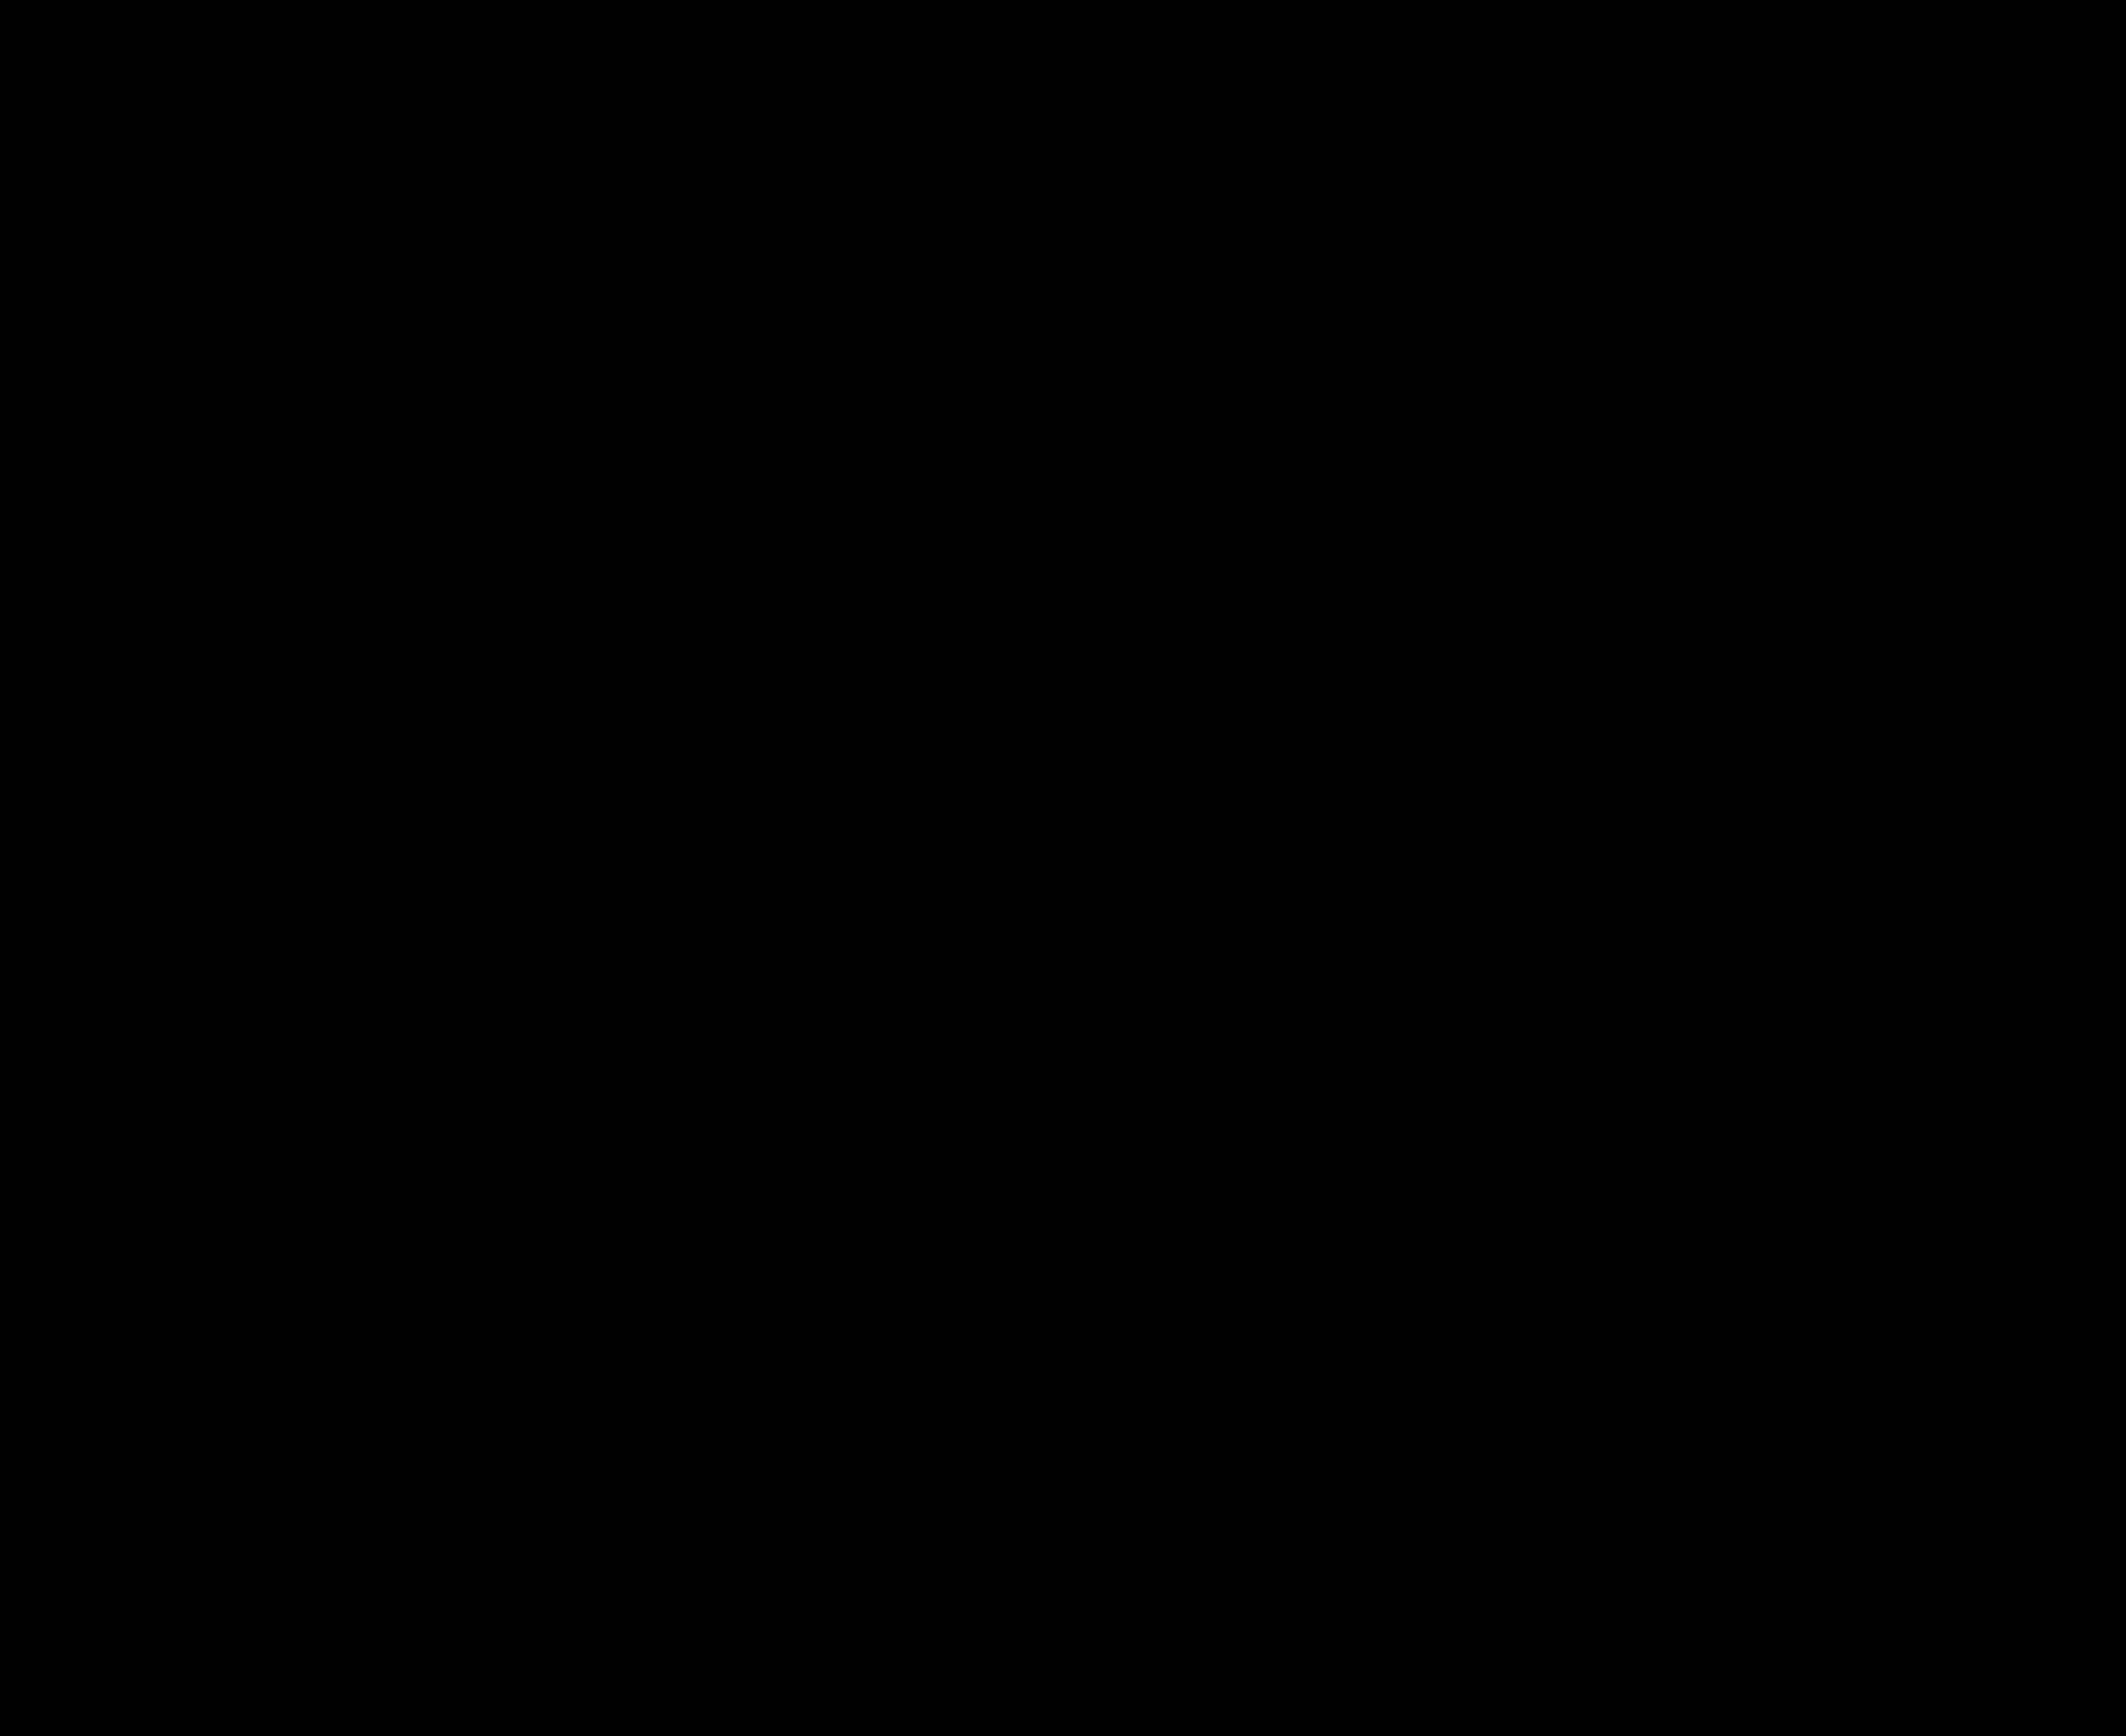 BIG IMAGE (PNG) - PNG Counting